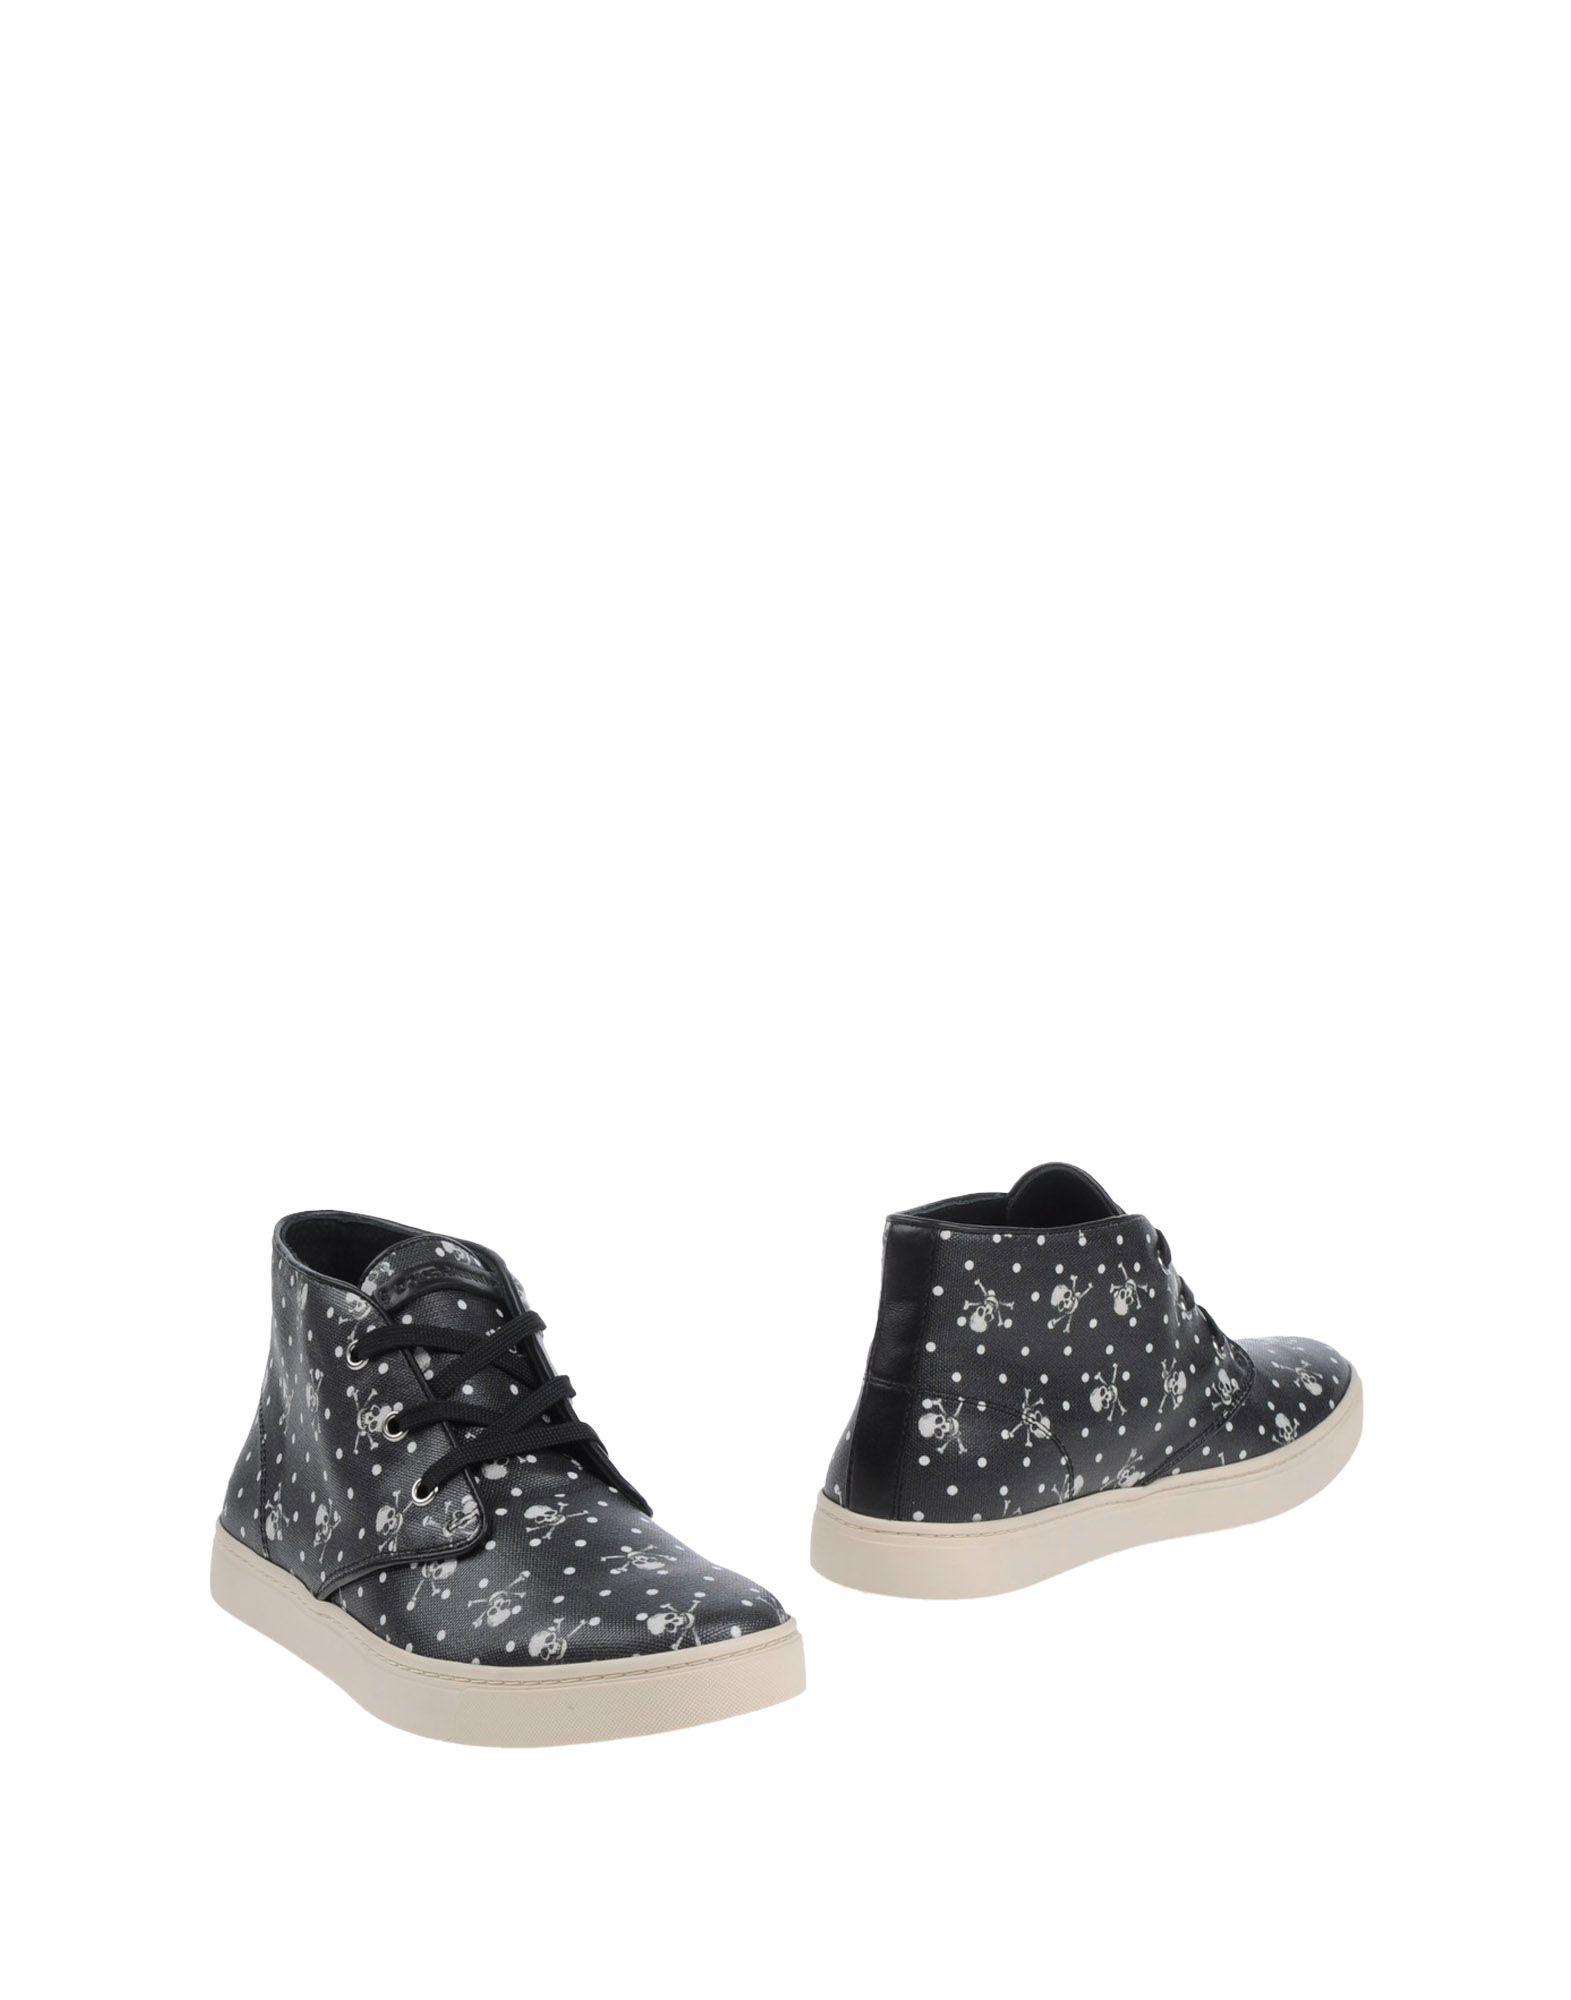 Dolce & Gabbana Boots Boots Boots - Men Dolce & Gabbana Boots online on  Australia - 11170285GF c7e904